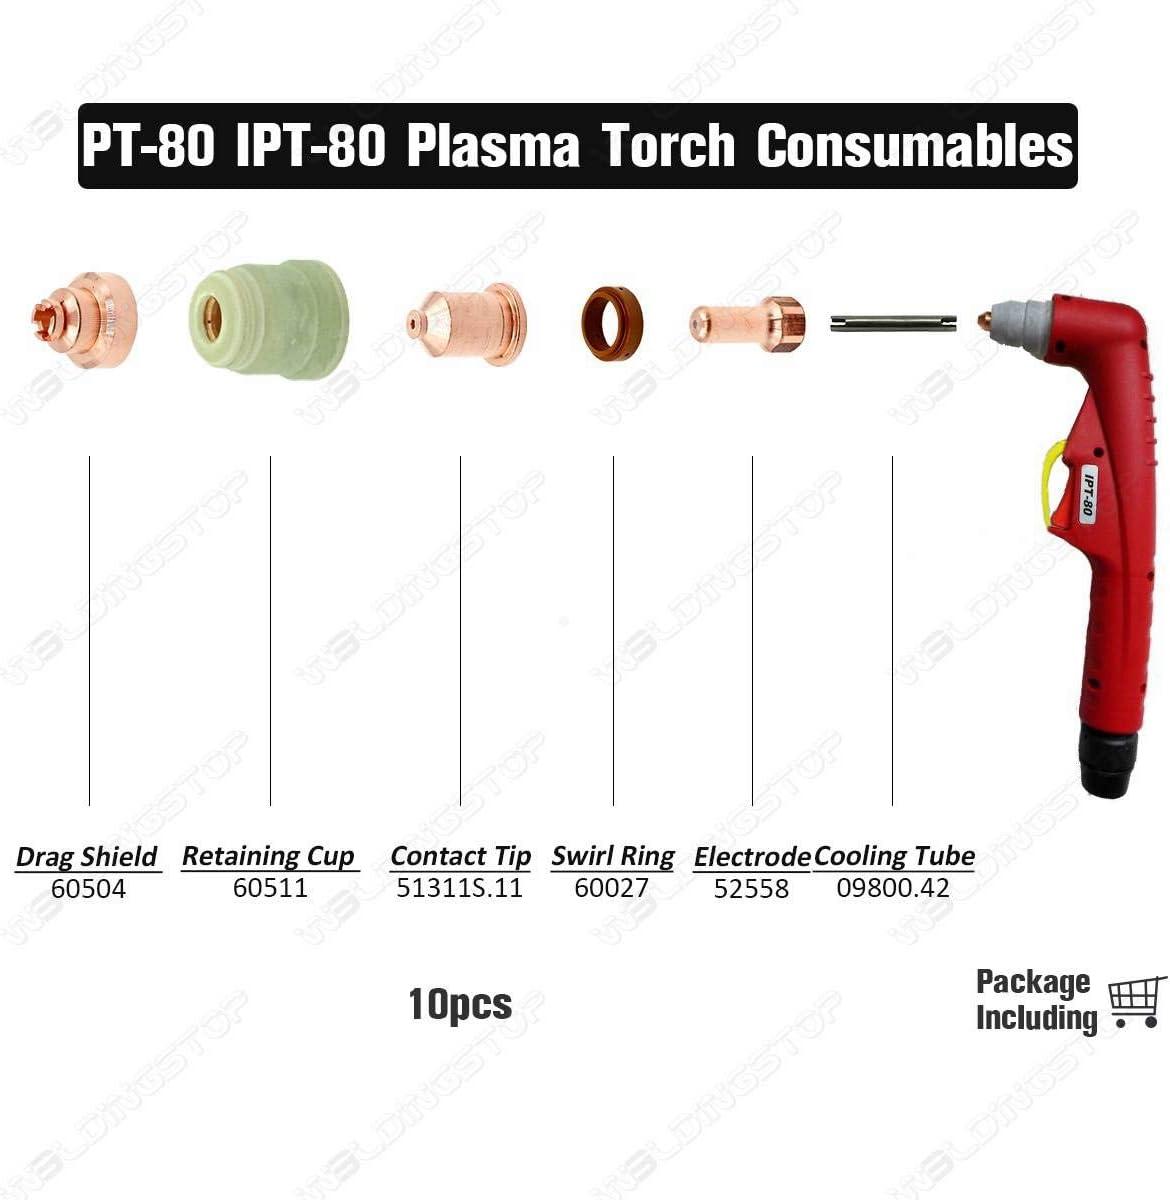 60A Fit PT-80 IPT80 Torch Consumables 10pcs Plasma Cutting 51311S.11 Contact Tip Nozzle 1.1mm 0.043 50A